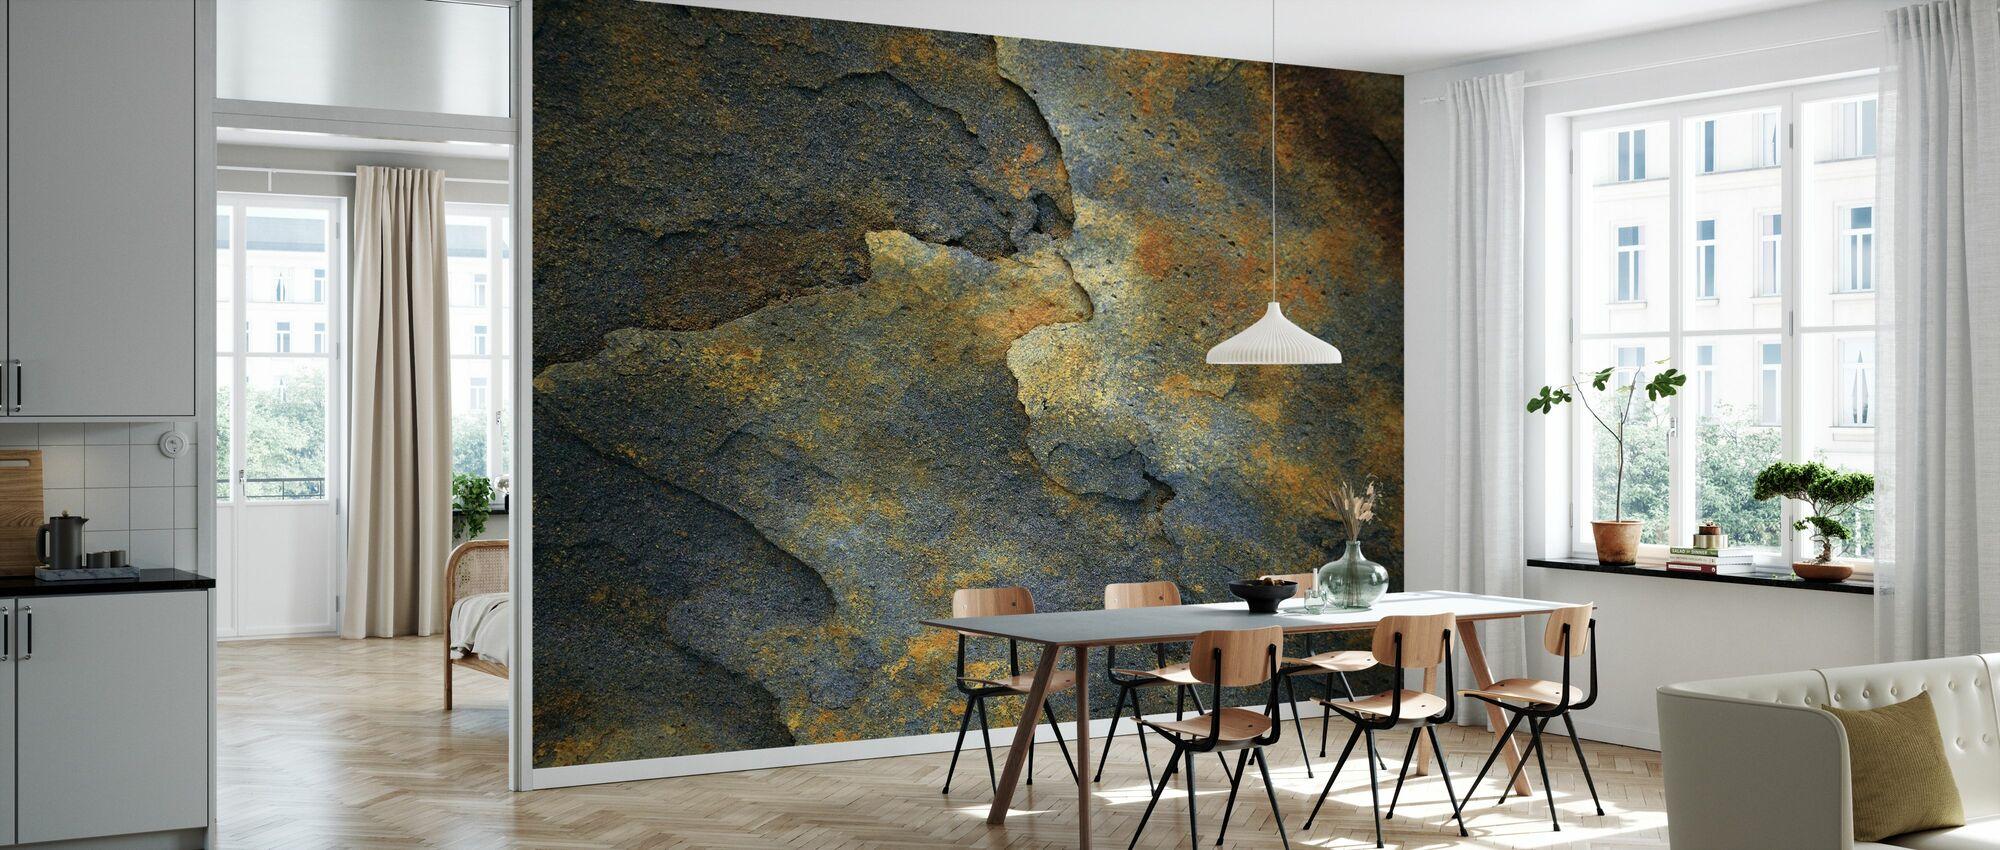 Mineral Rock - Wallpaper - Kitchen